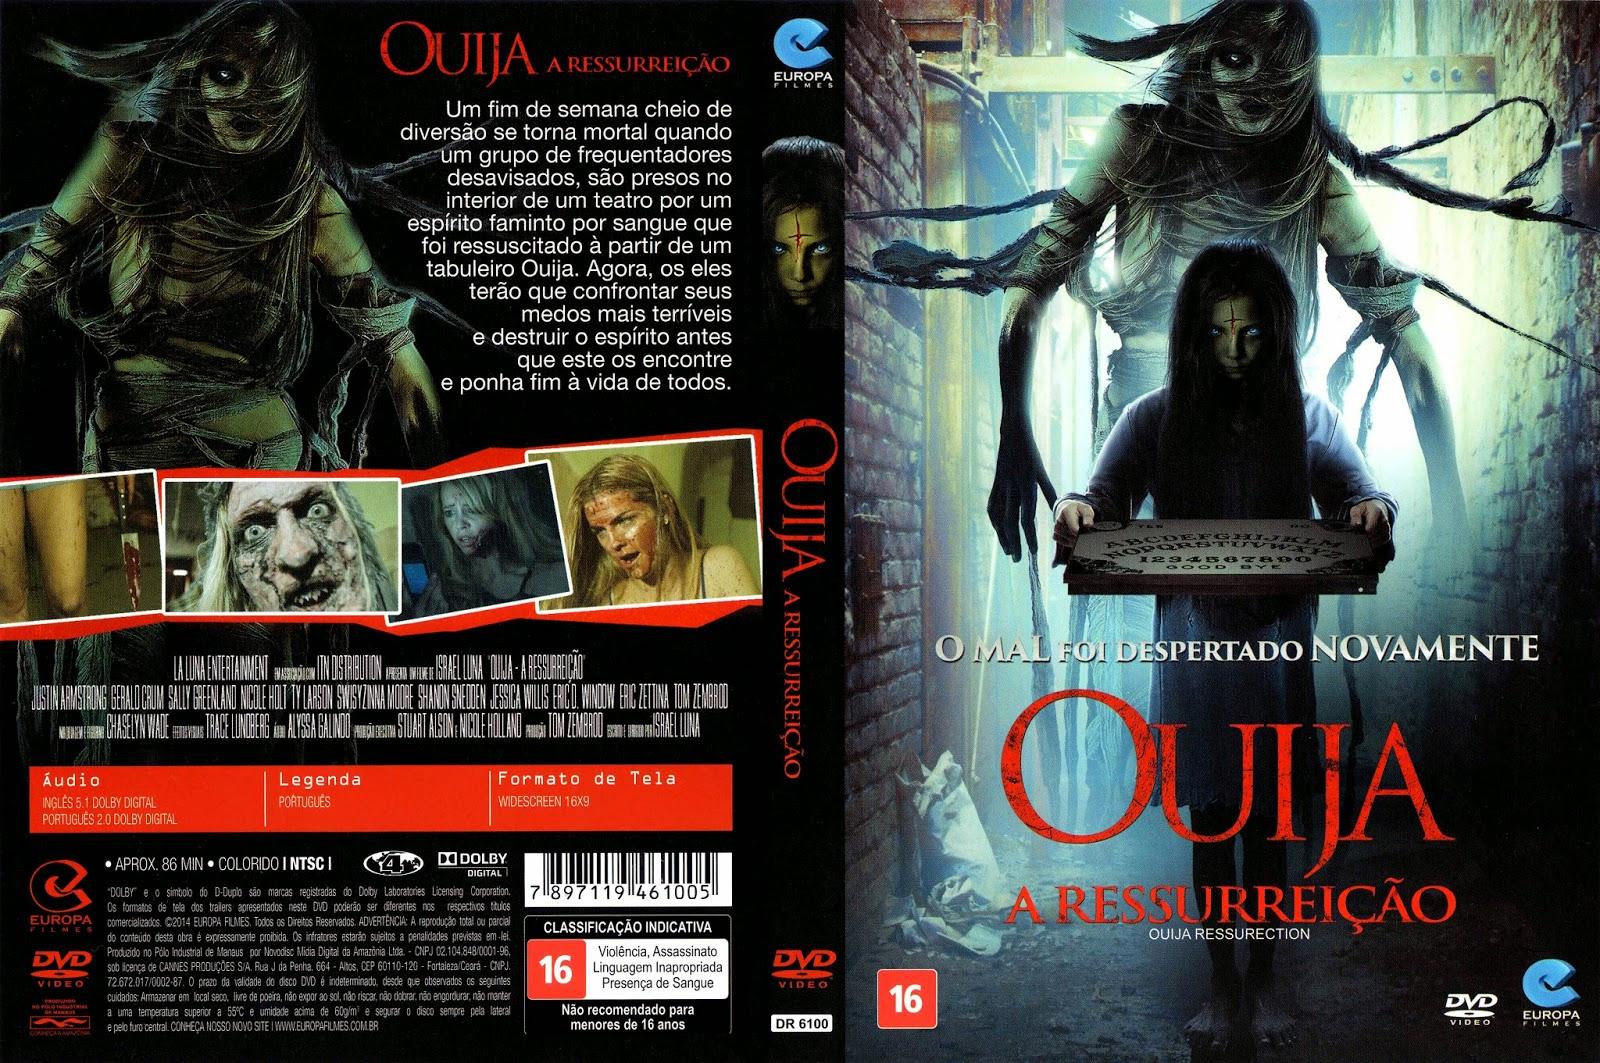 Download Ouija A Ressurreição DVDRip XviD Dual Áudio Ouija 2B  2BO 2BJogo 2BDos 2BEsp C3 ADritos